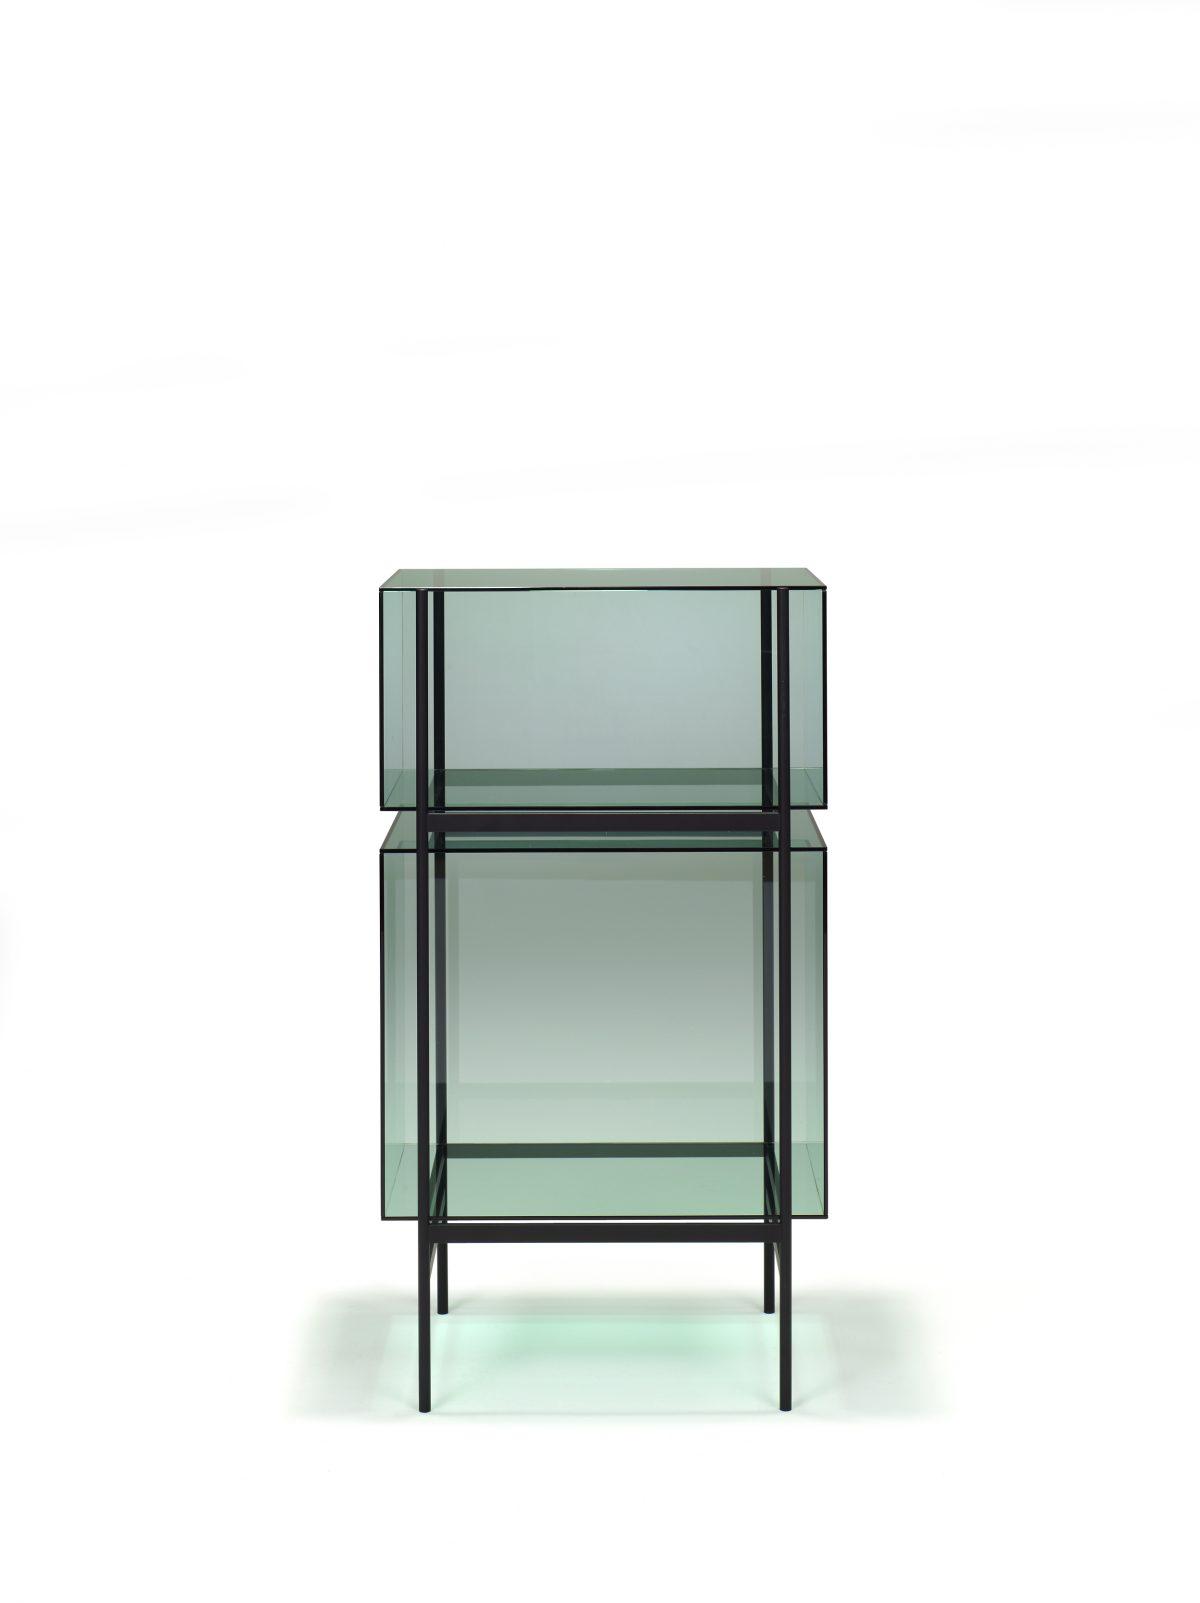 Kast LYN 2 Vakken JOSHH Visser Meijwaard Exclusief Dutchdesign Oranje Frame Groen Glas JOSHH& 10